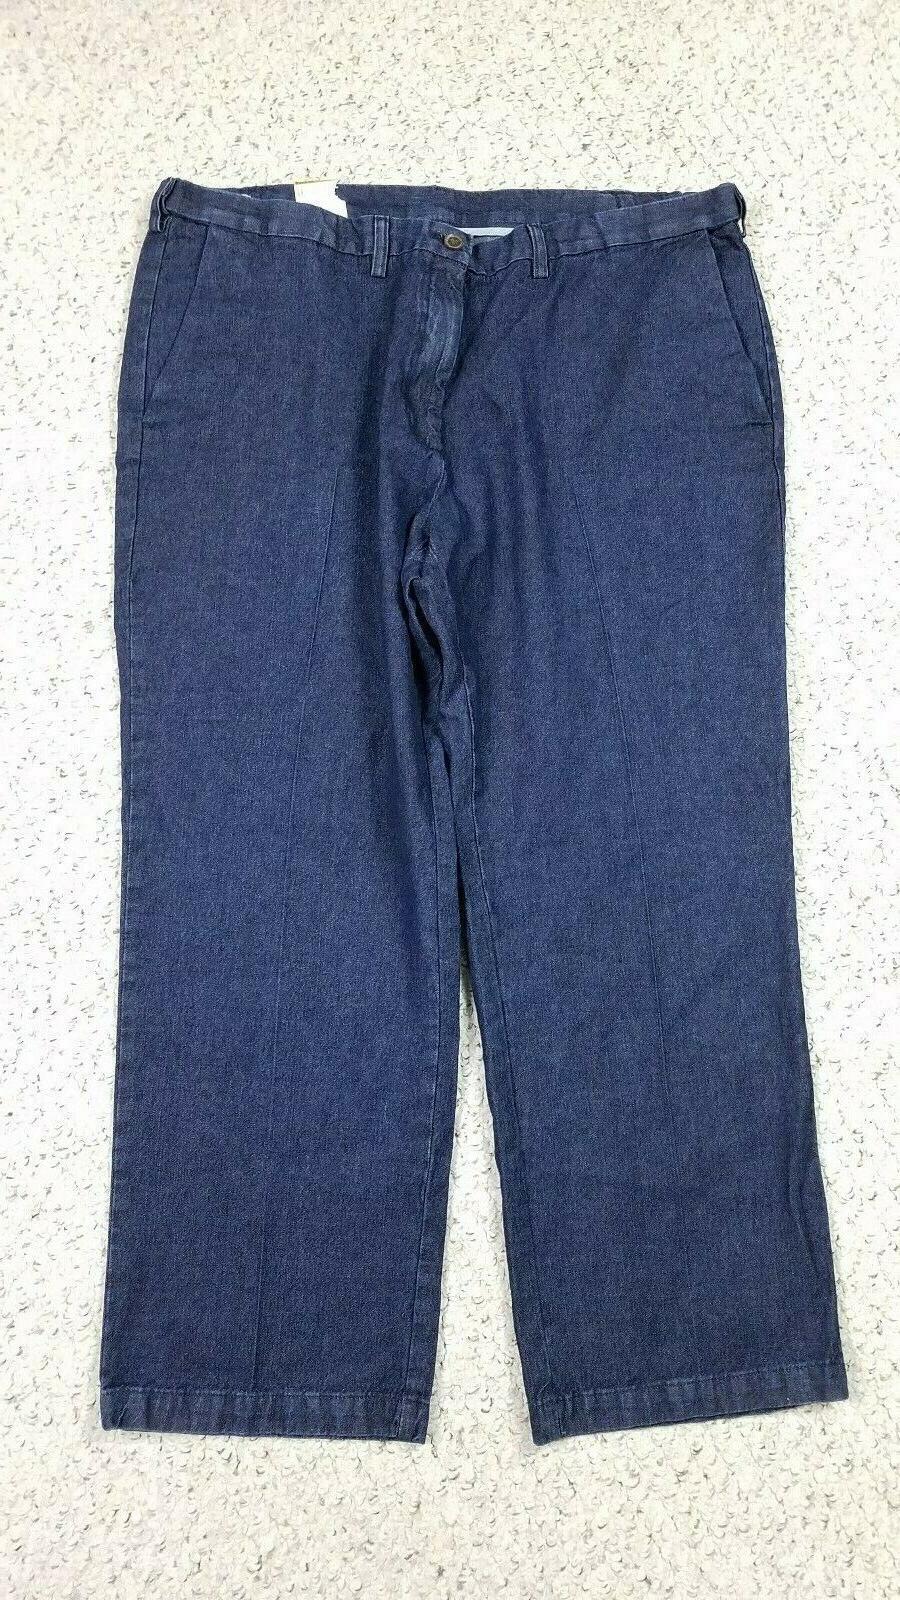 NEW Men's Fit Dark Trouser Blue Work Weekend